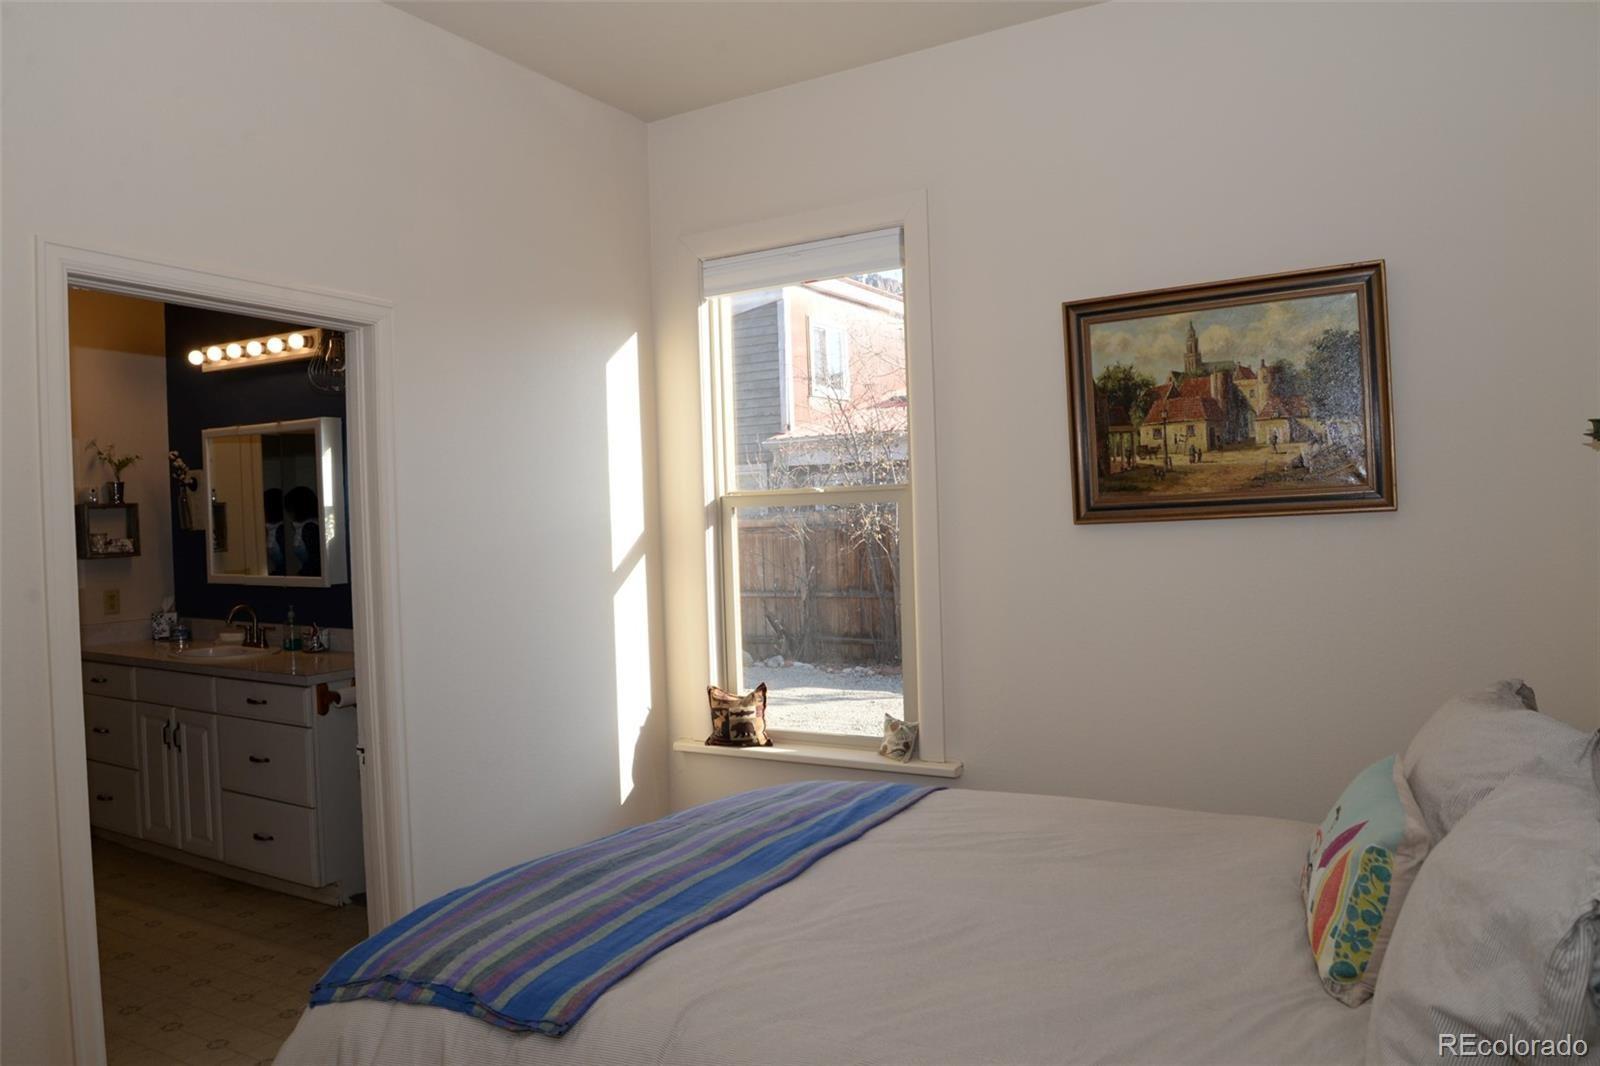 MLS# 4440915 - 19 - 406 Cedar Street, Buena Vista, CO 81211